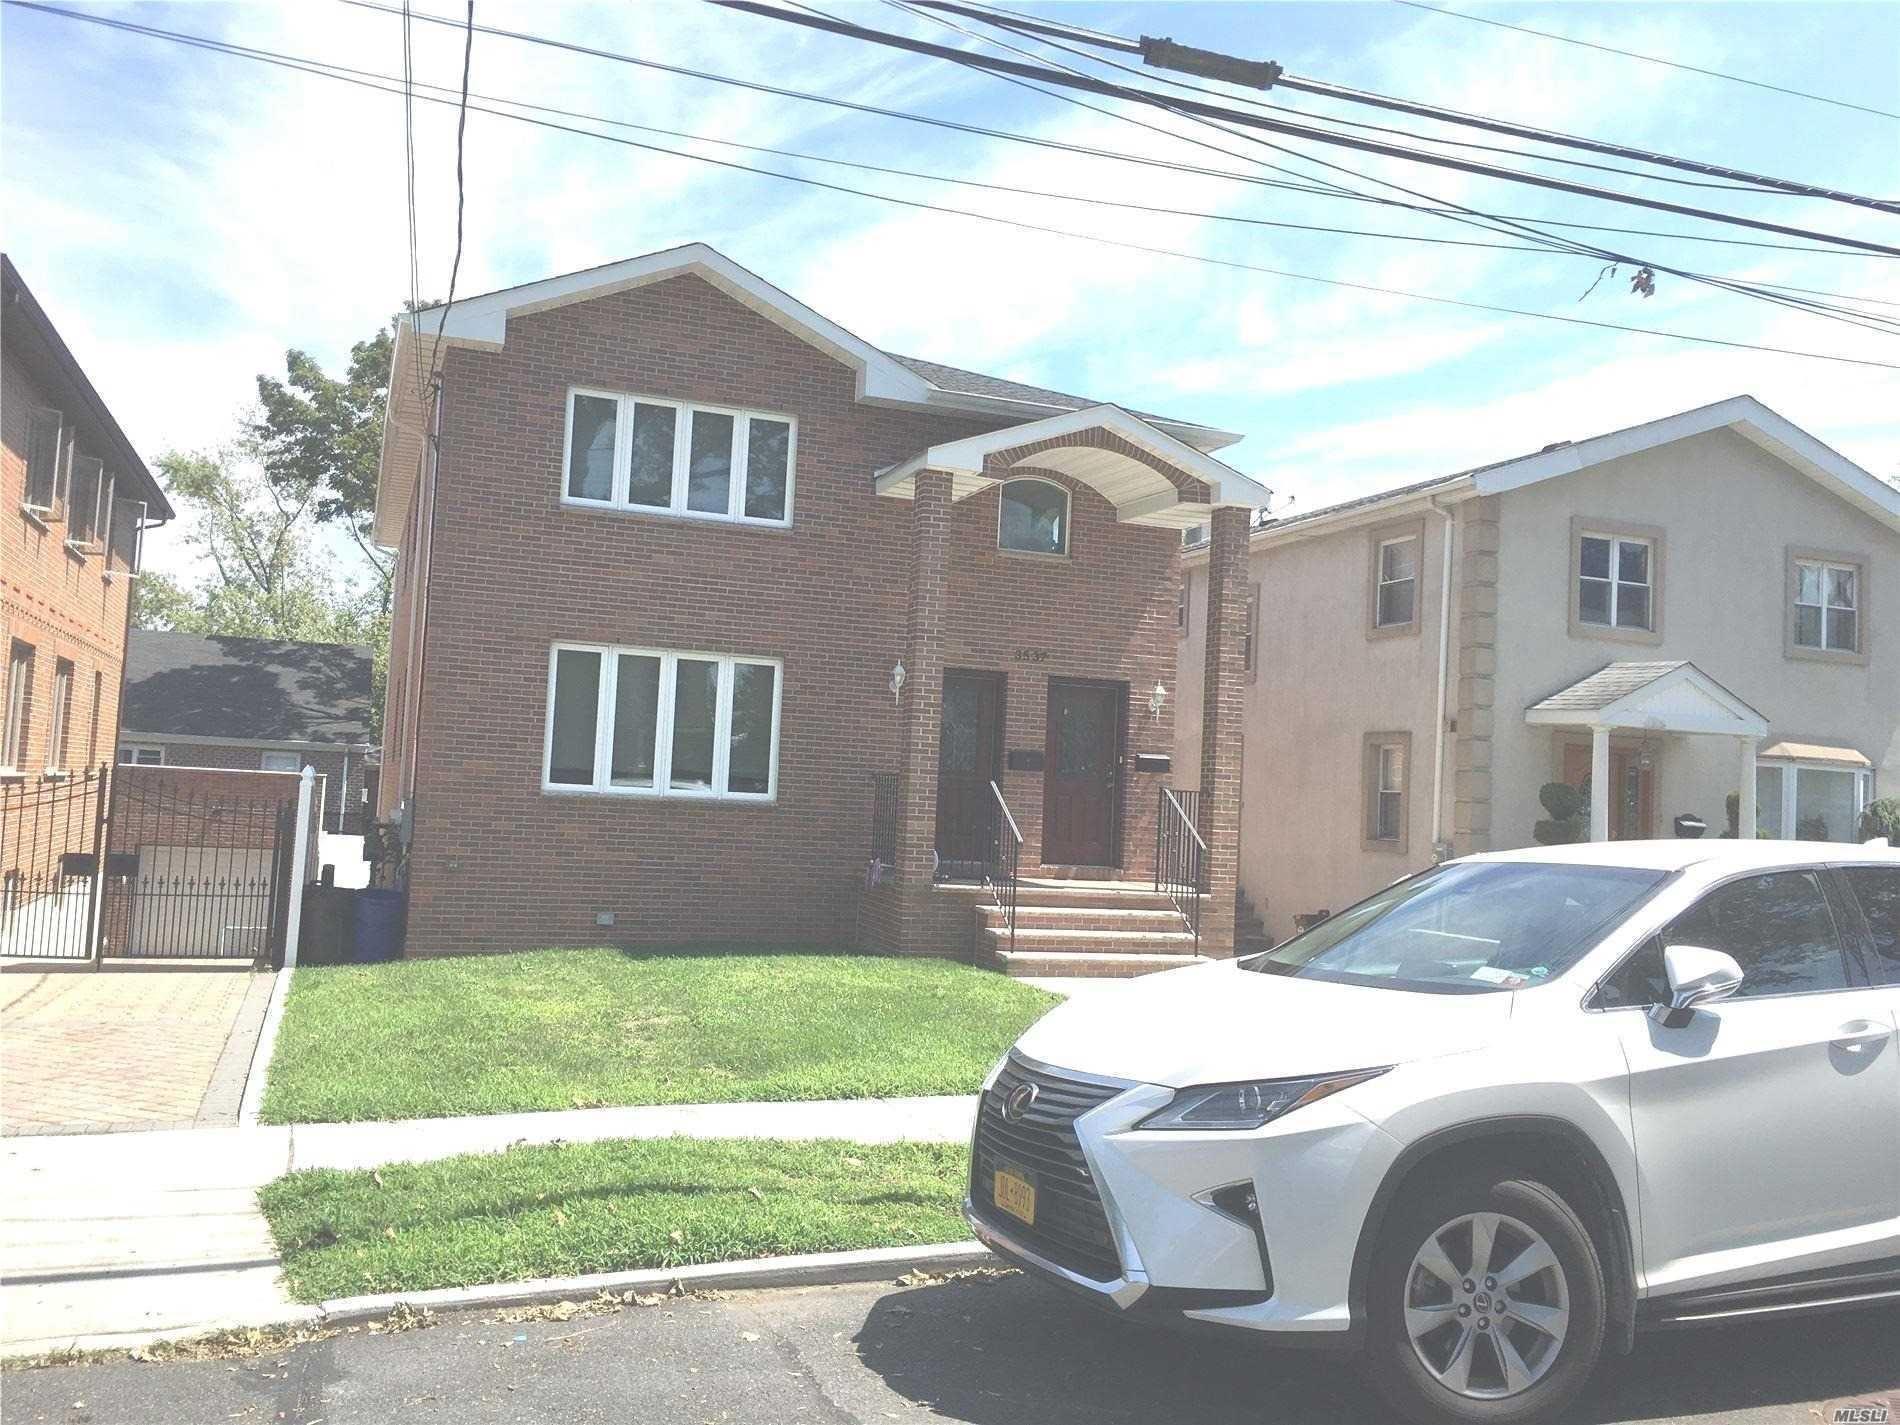 35-37 204th Street #1st fl, Bayside, NY 11361 - MLS#: 3243298